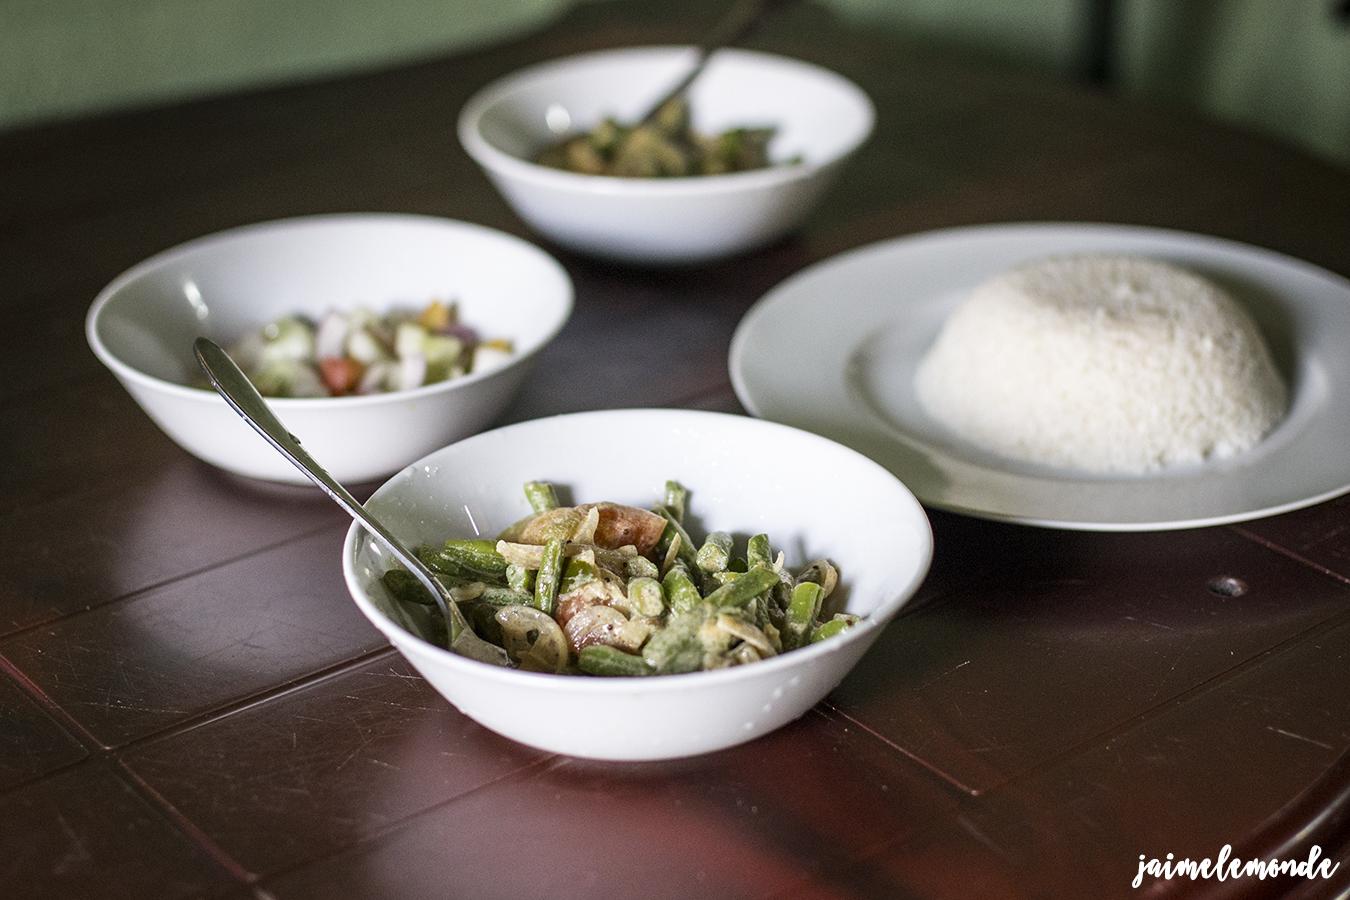 negombo-apprendre-a-cuisiner-avec-ragu-negombo-beach-house-guest-house-voyage-au-sri-lanka-jaimelemonde-15